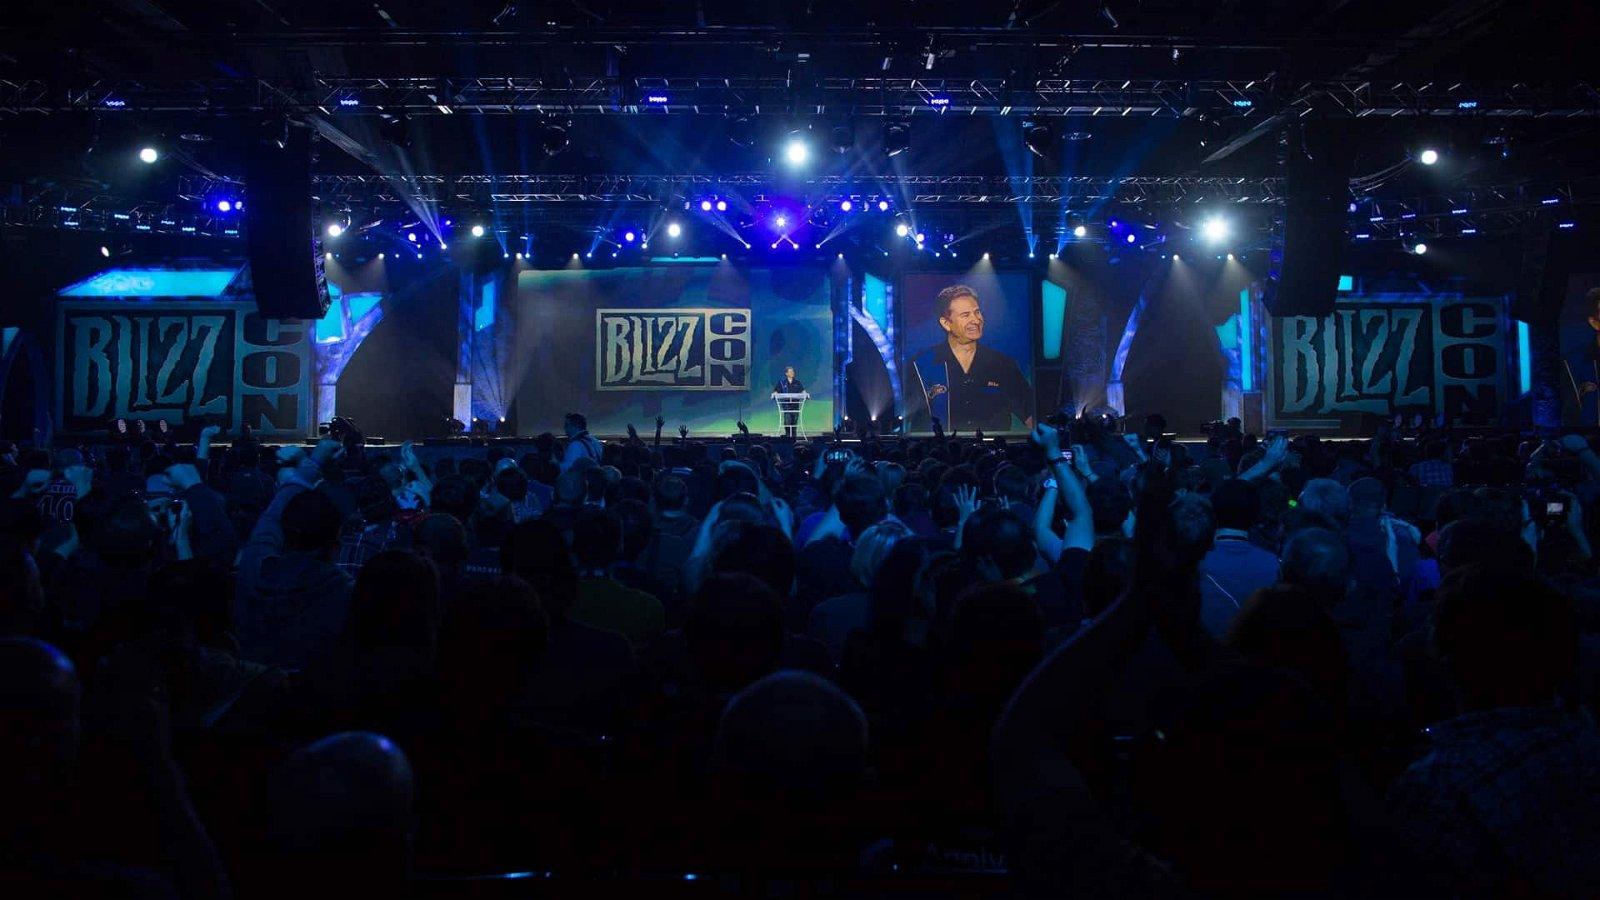 BlizzCon 2018: Blizzard Unleashes Epic Community Spotlights 1